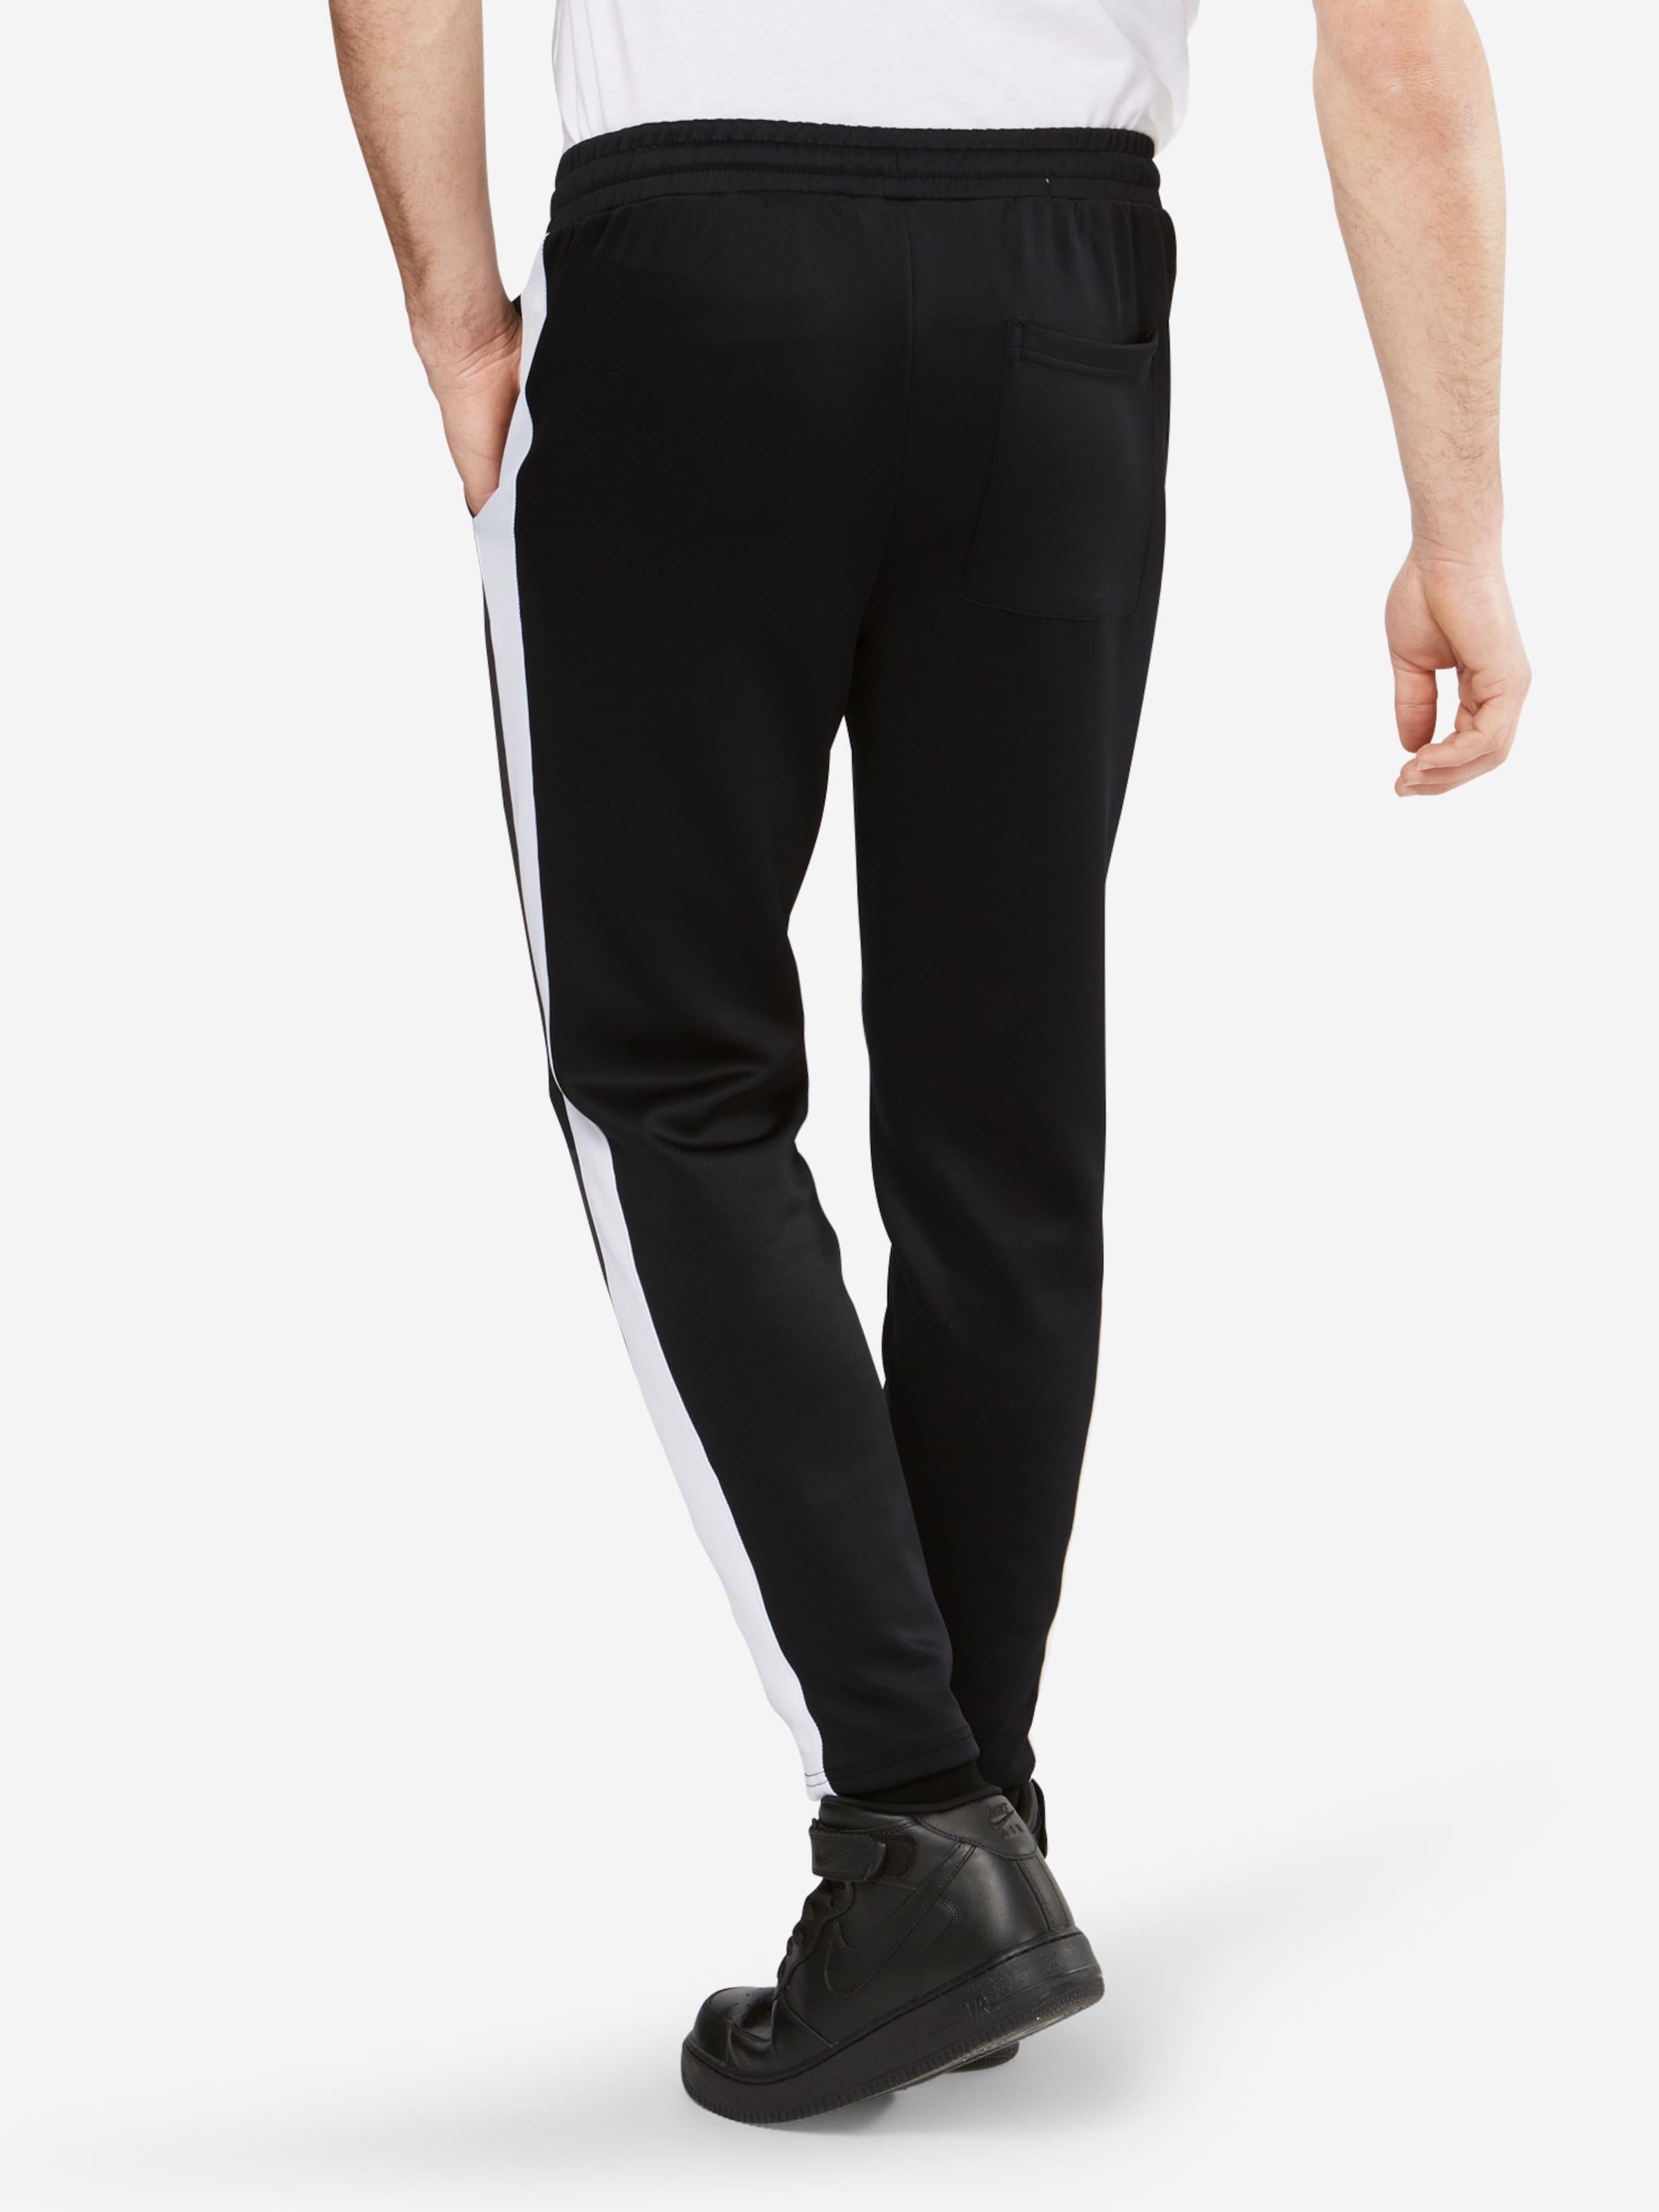 NoirBlanc Ww Jones 'jjivega En Jackamp; Jjretro Pantalon Black Noos' rBdxoCeW